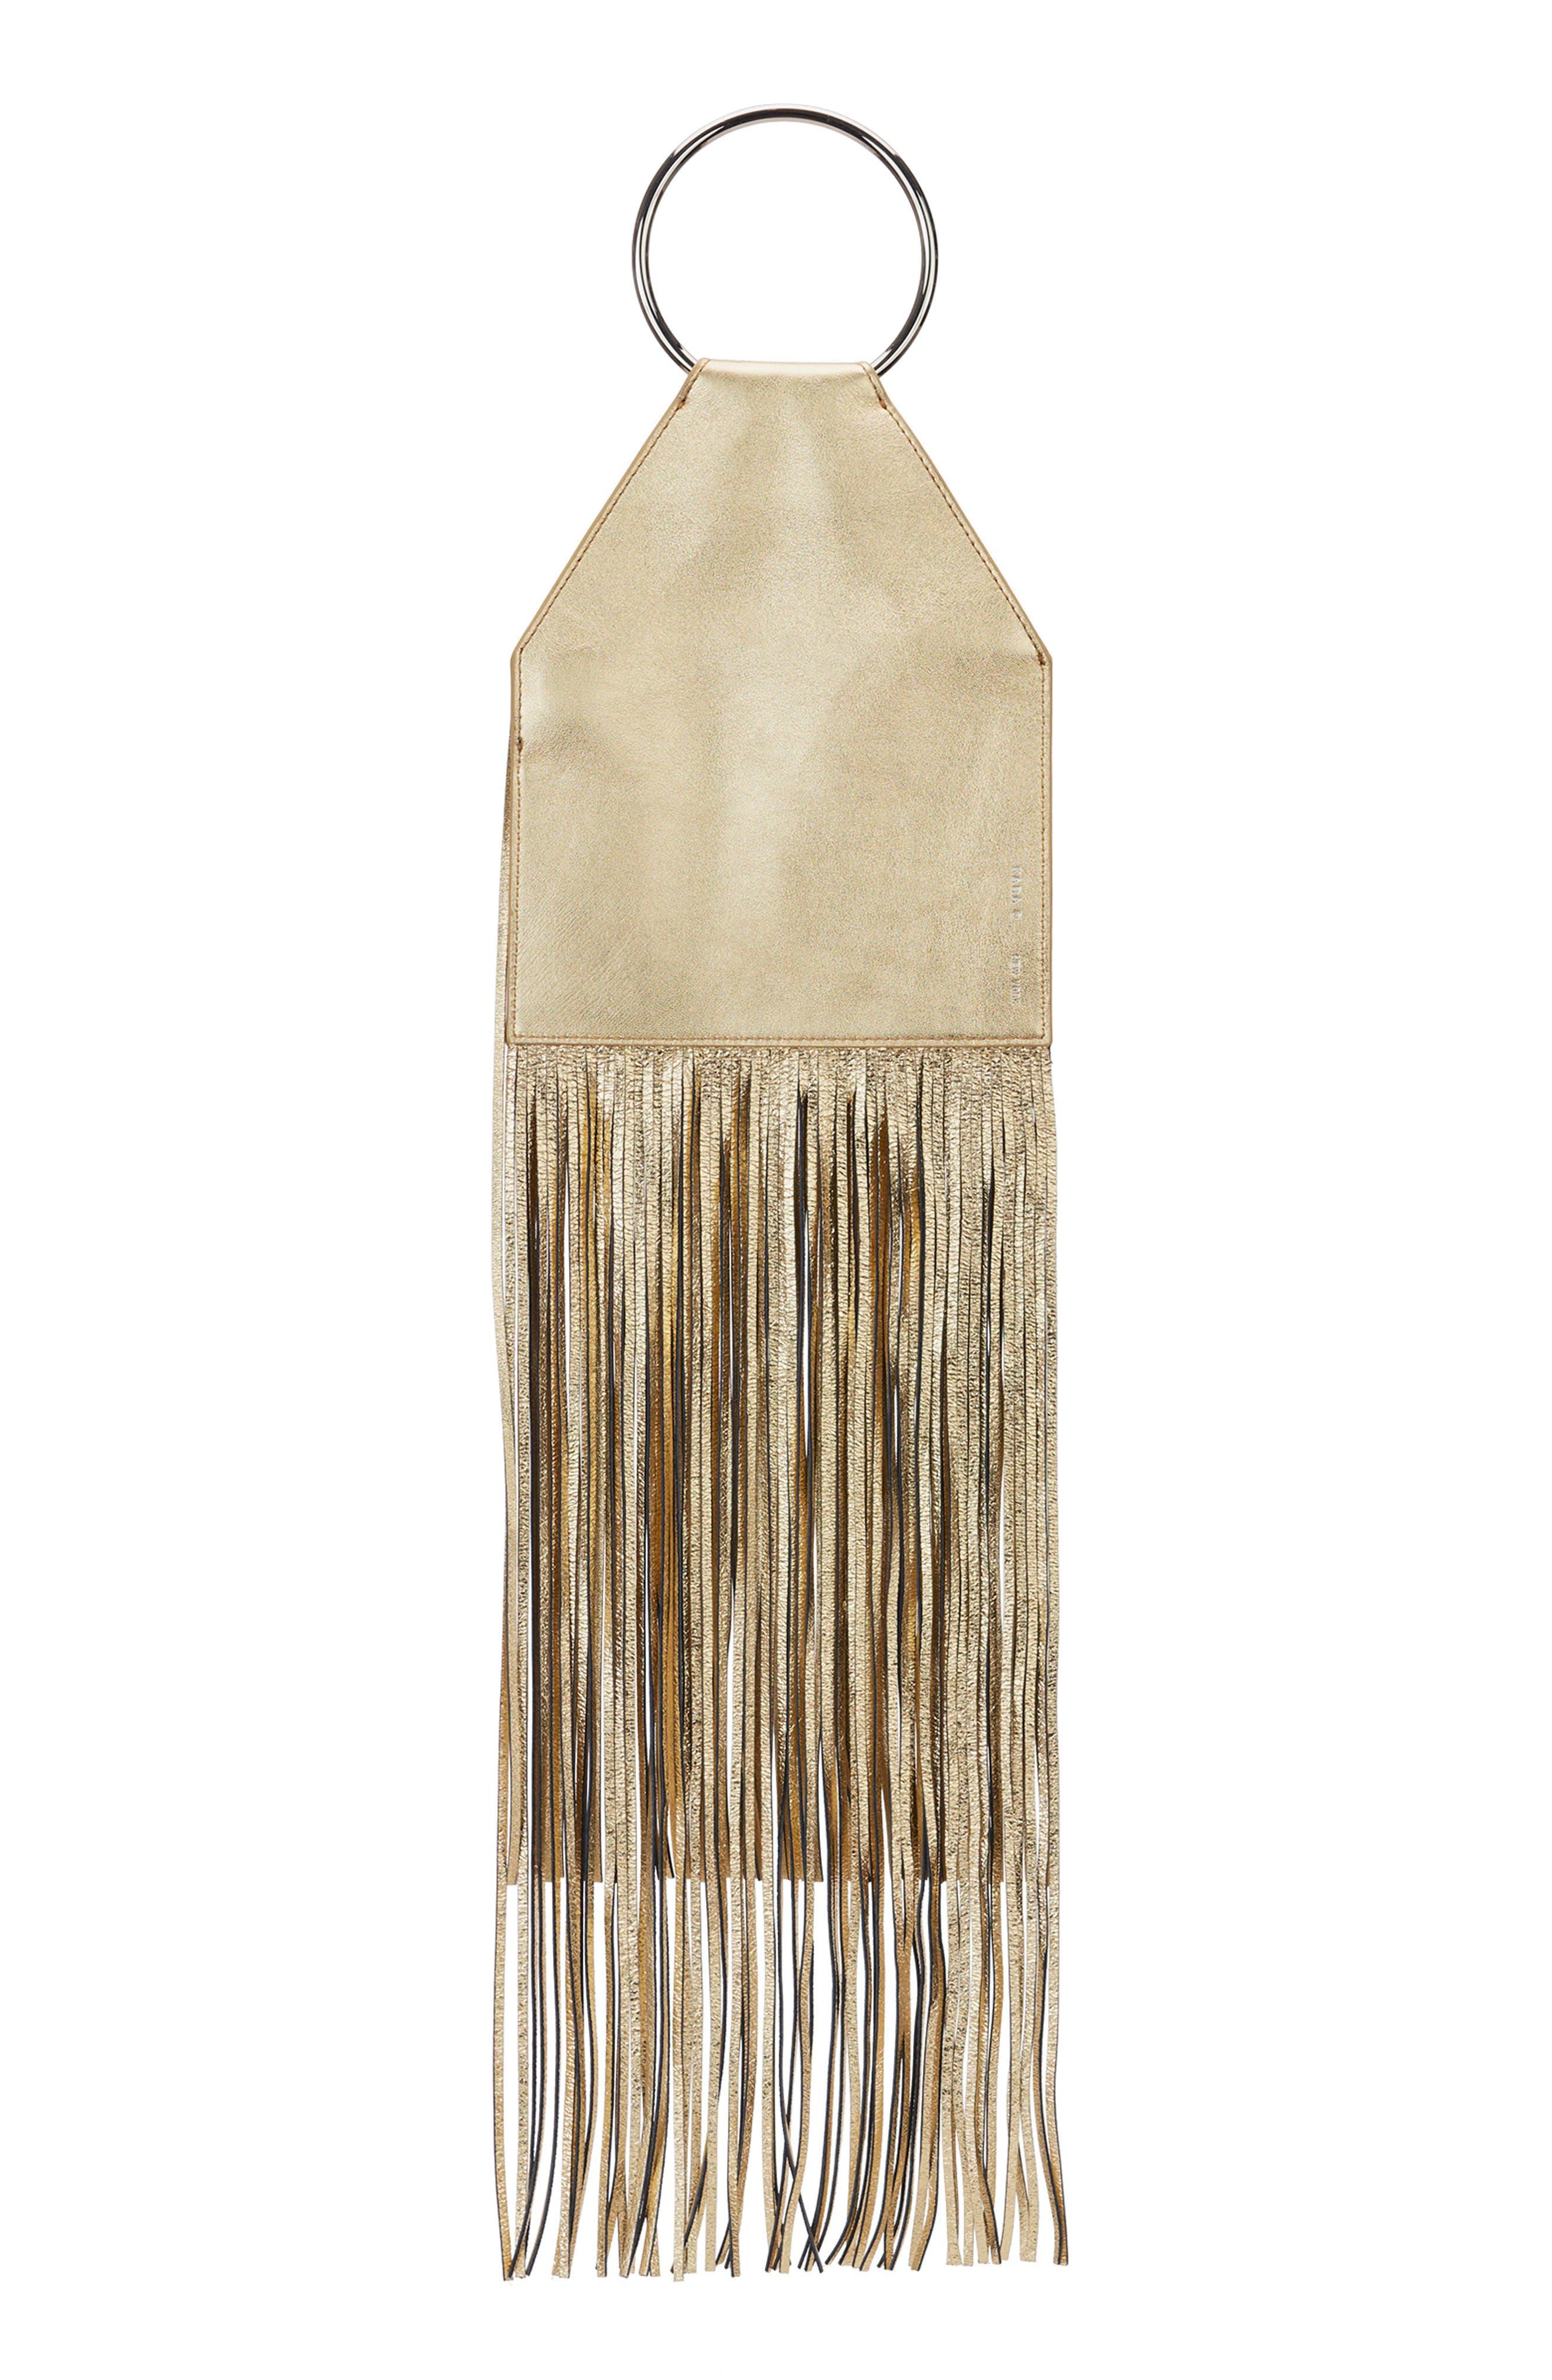 KARA Fringe Lambskin Ring Clutch - Metallic in Gold